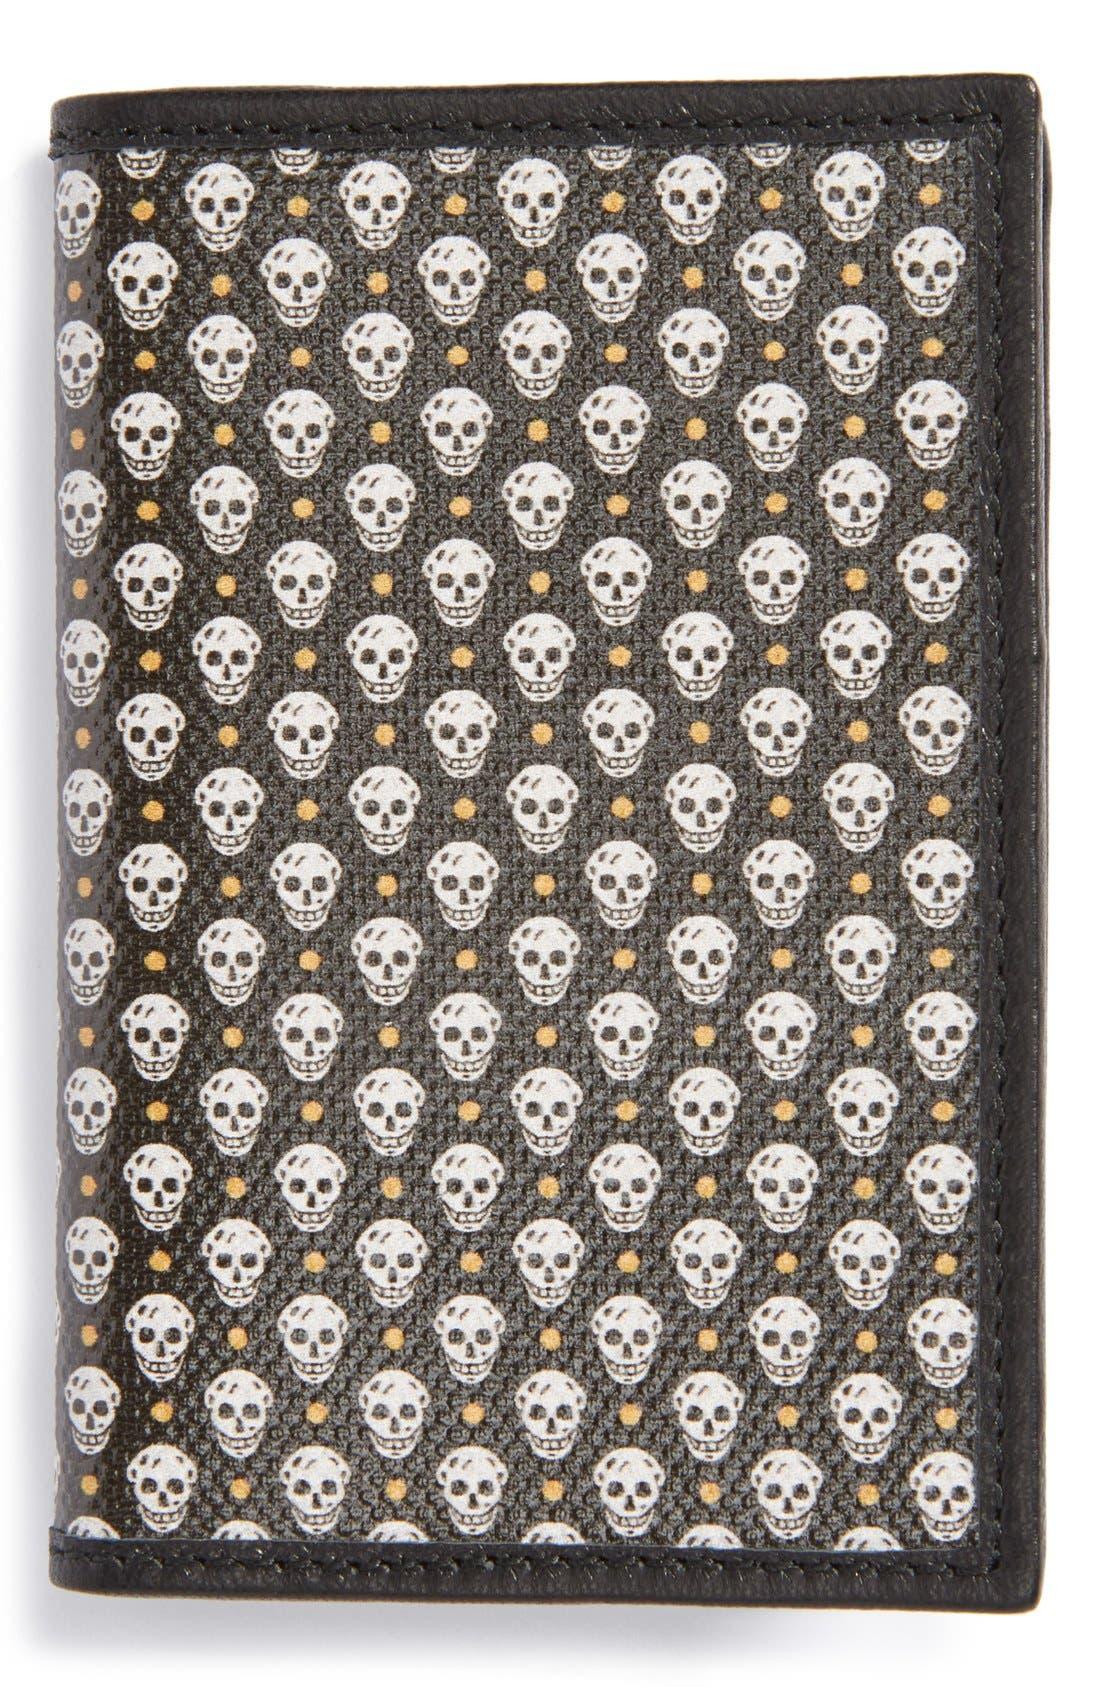 Main Image - Alexander McQueen Skull Print Leather Card Holder